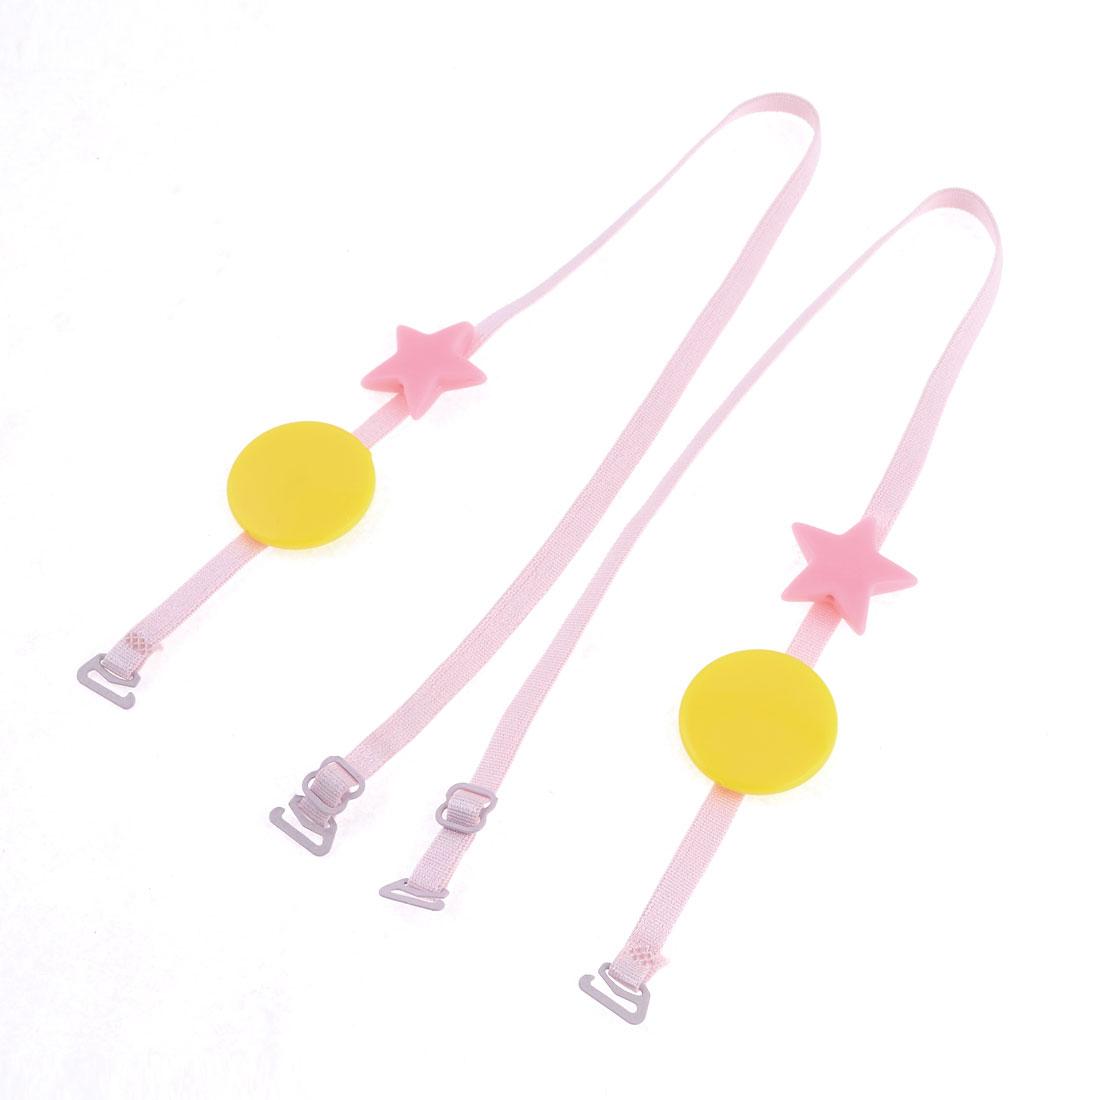 Lady Plastic Stars Decor Adjusting Lingerie Bra Straps Pink Pair